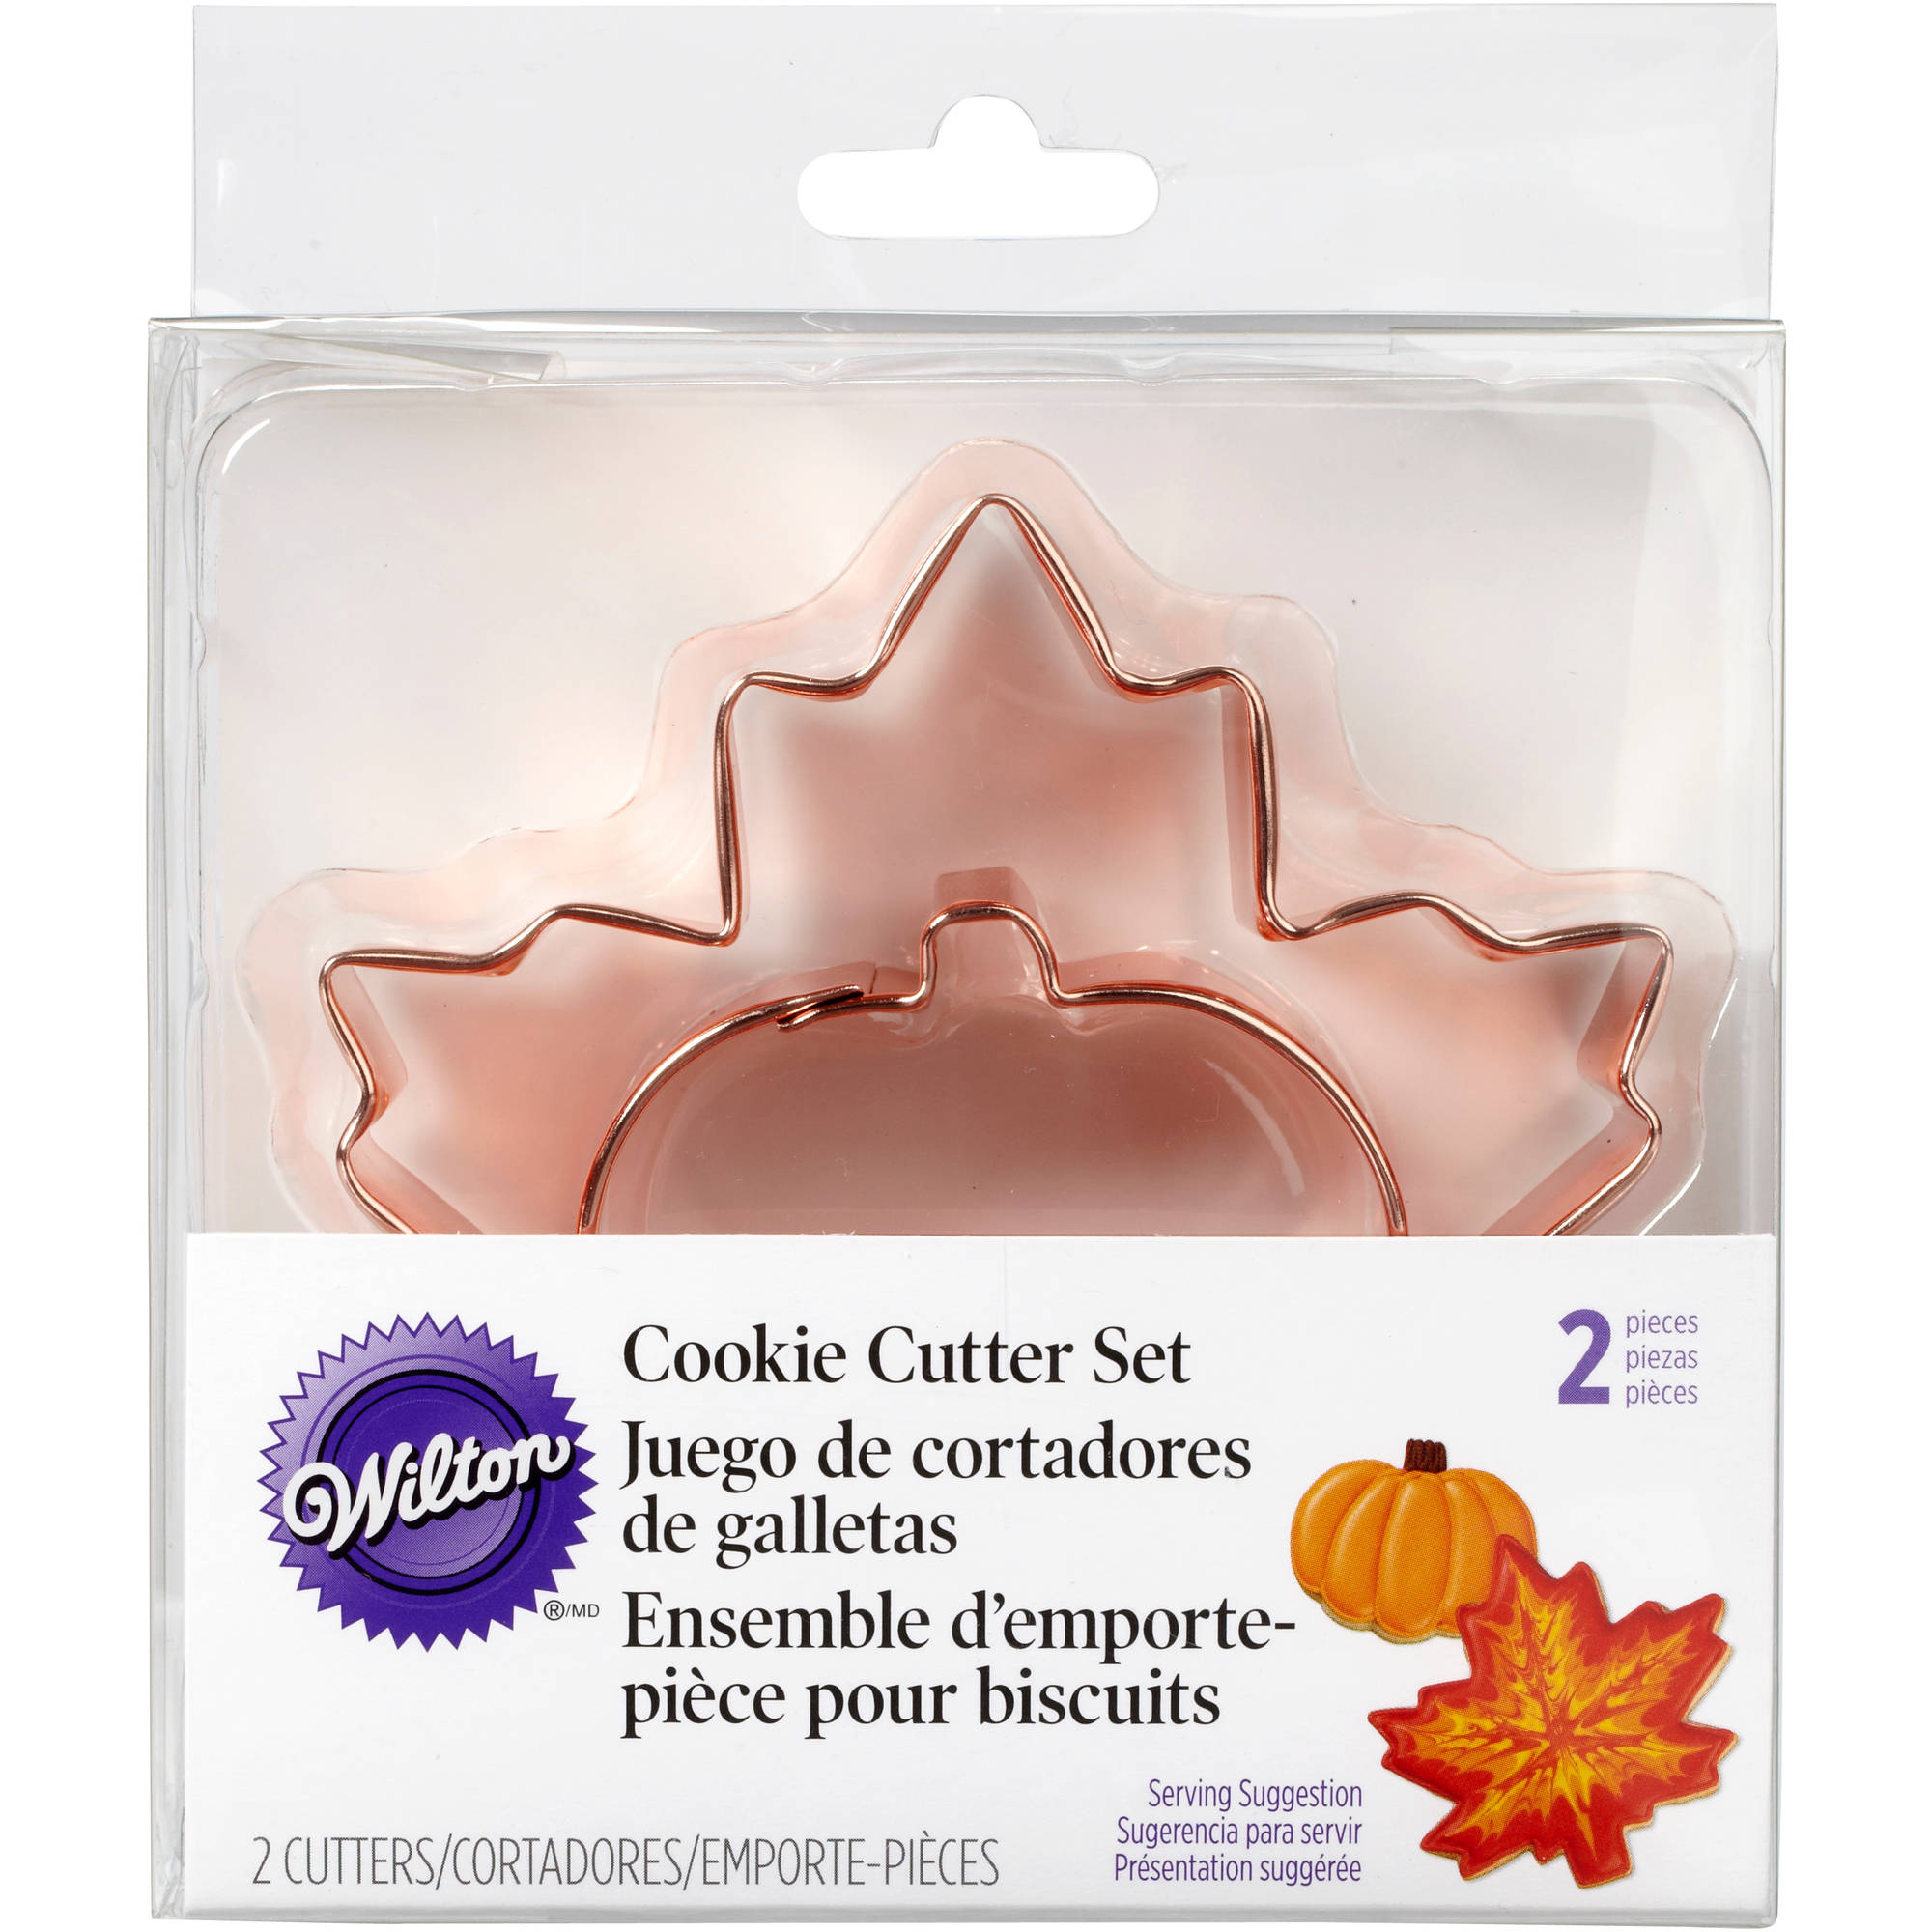 Walmart cookie cutters